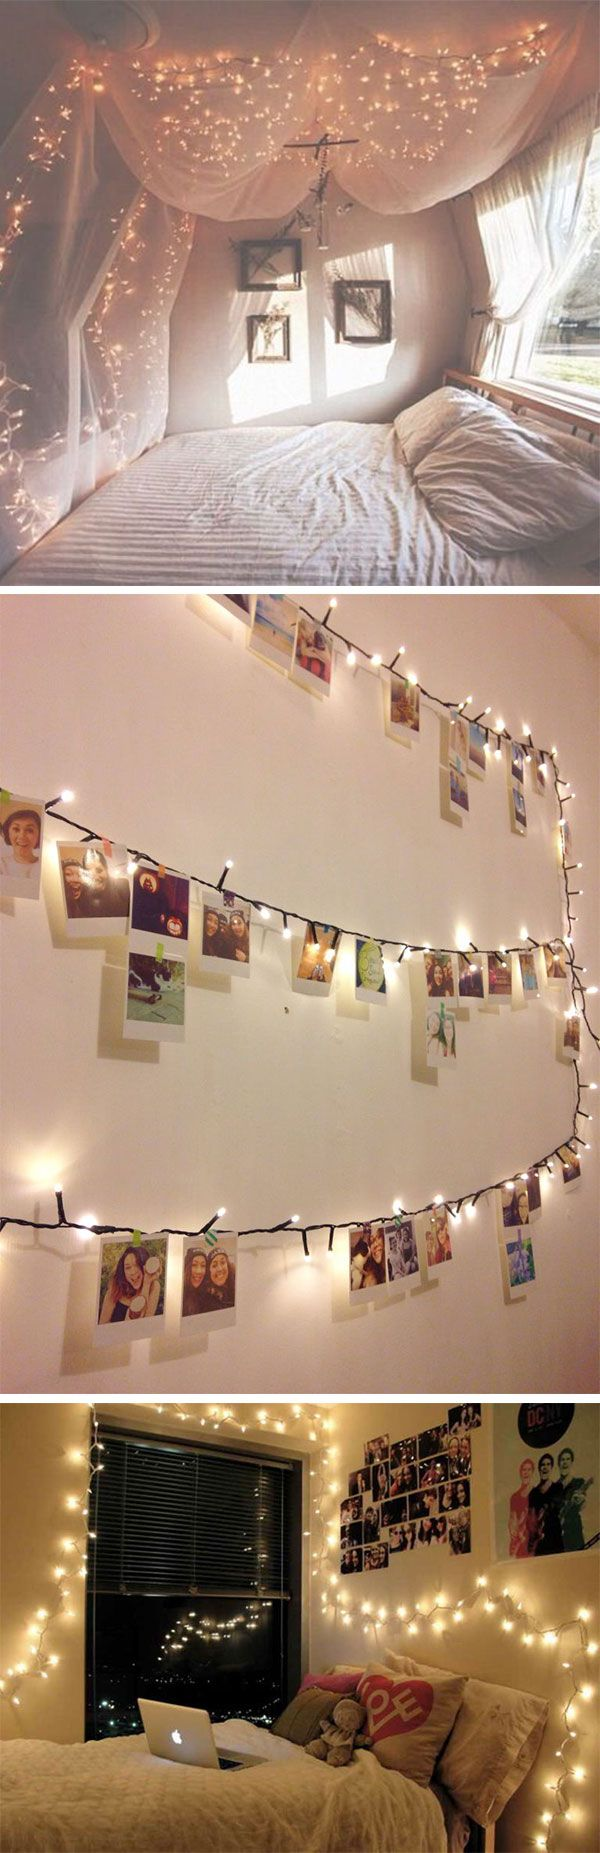 25 Best Ideas About Diy Bedroom Decor On Pinterest Kids Bedroom